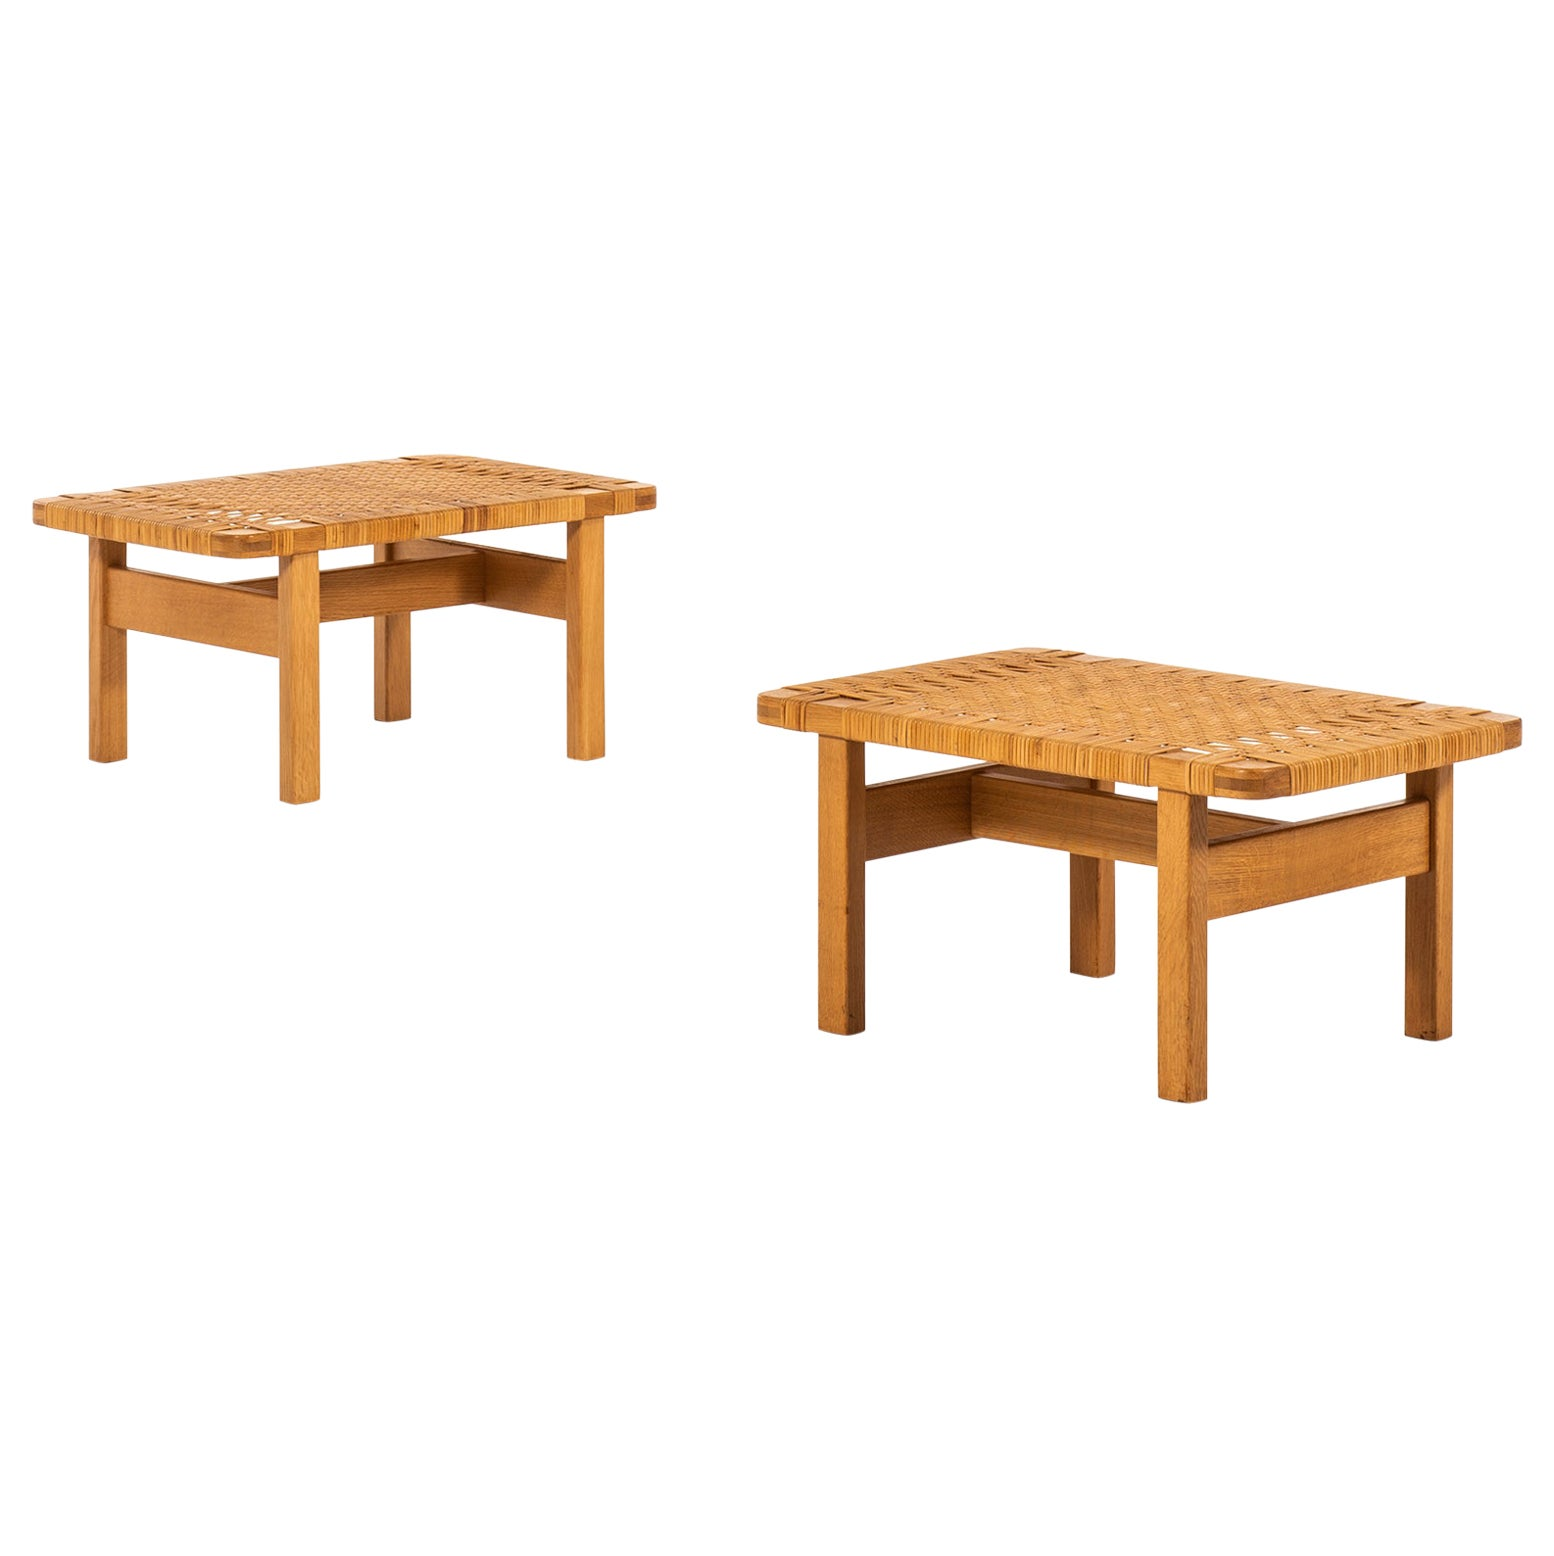 Børge Mogensen Side Tables by Fredericia Stolefabrik in Denmark